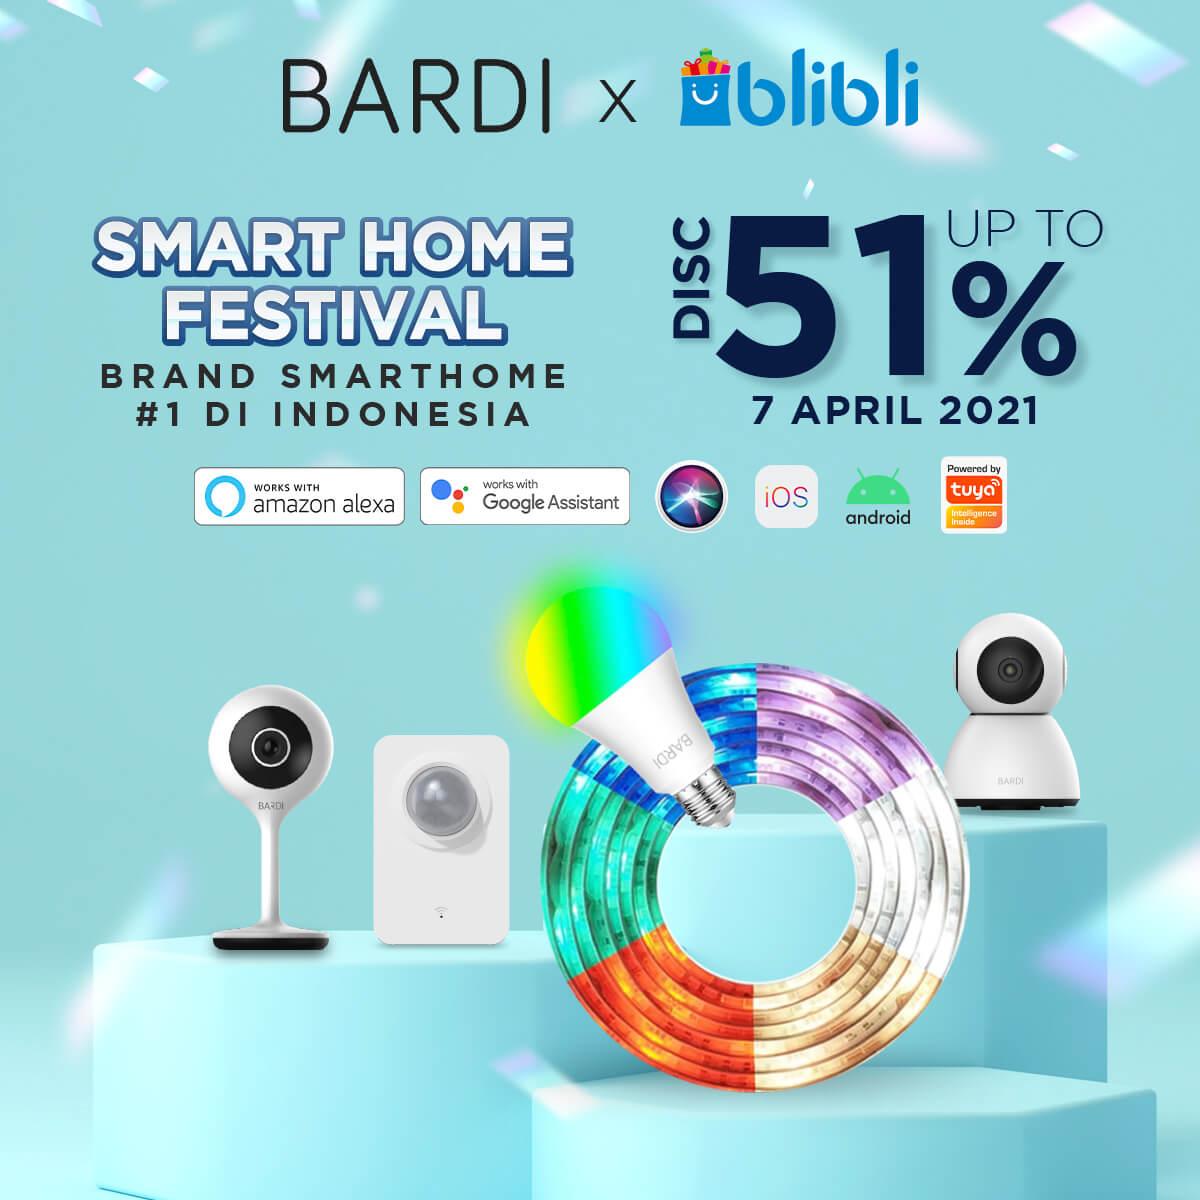 BARDI-Blibli-April-smart-home-festival_Ads-1200x1200 (1)